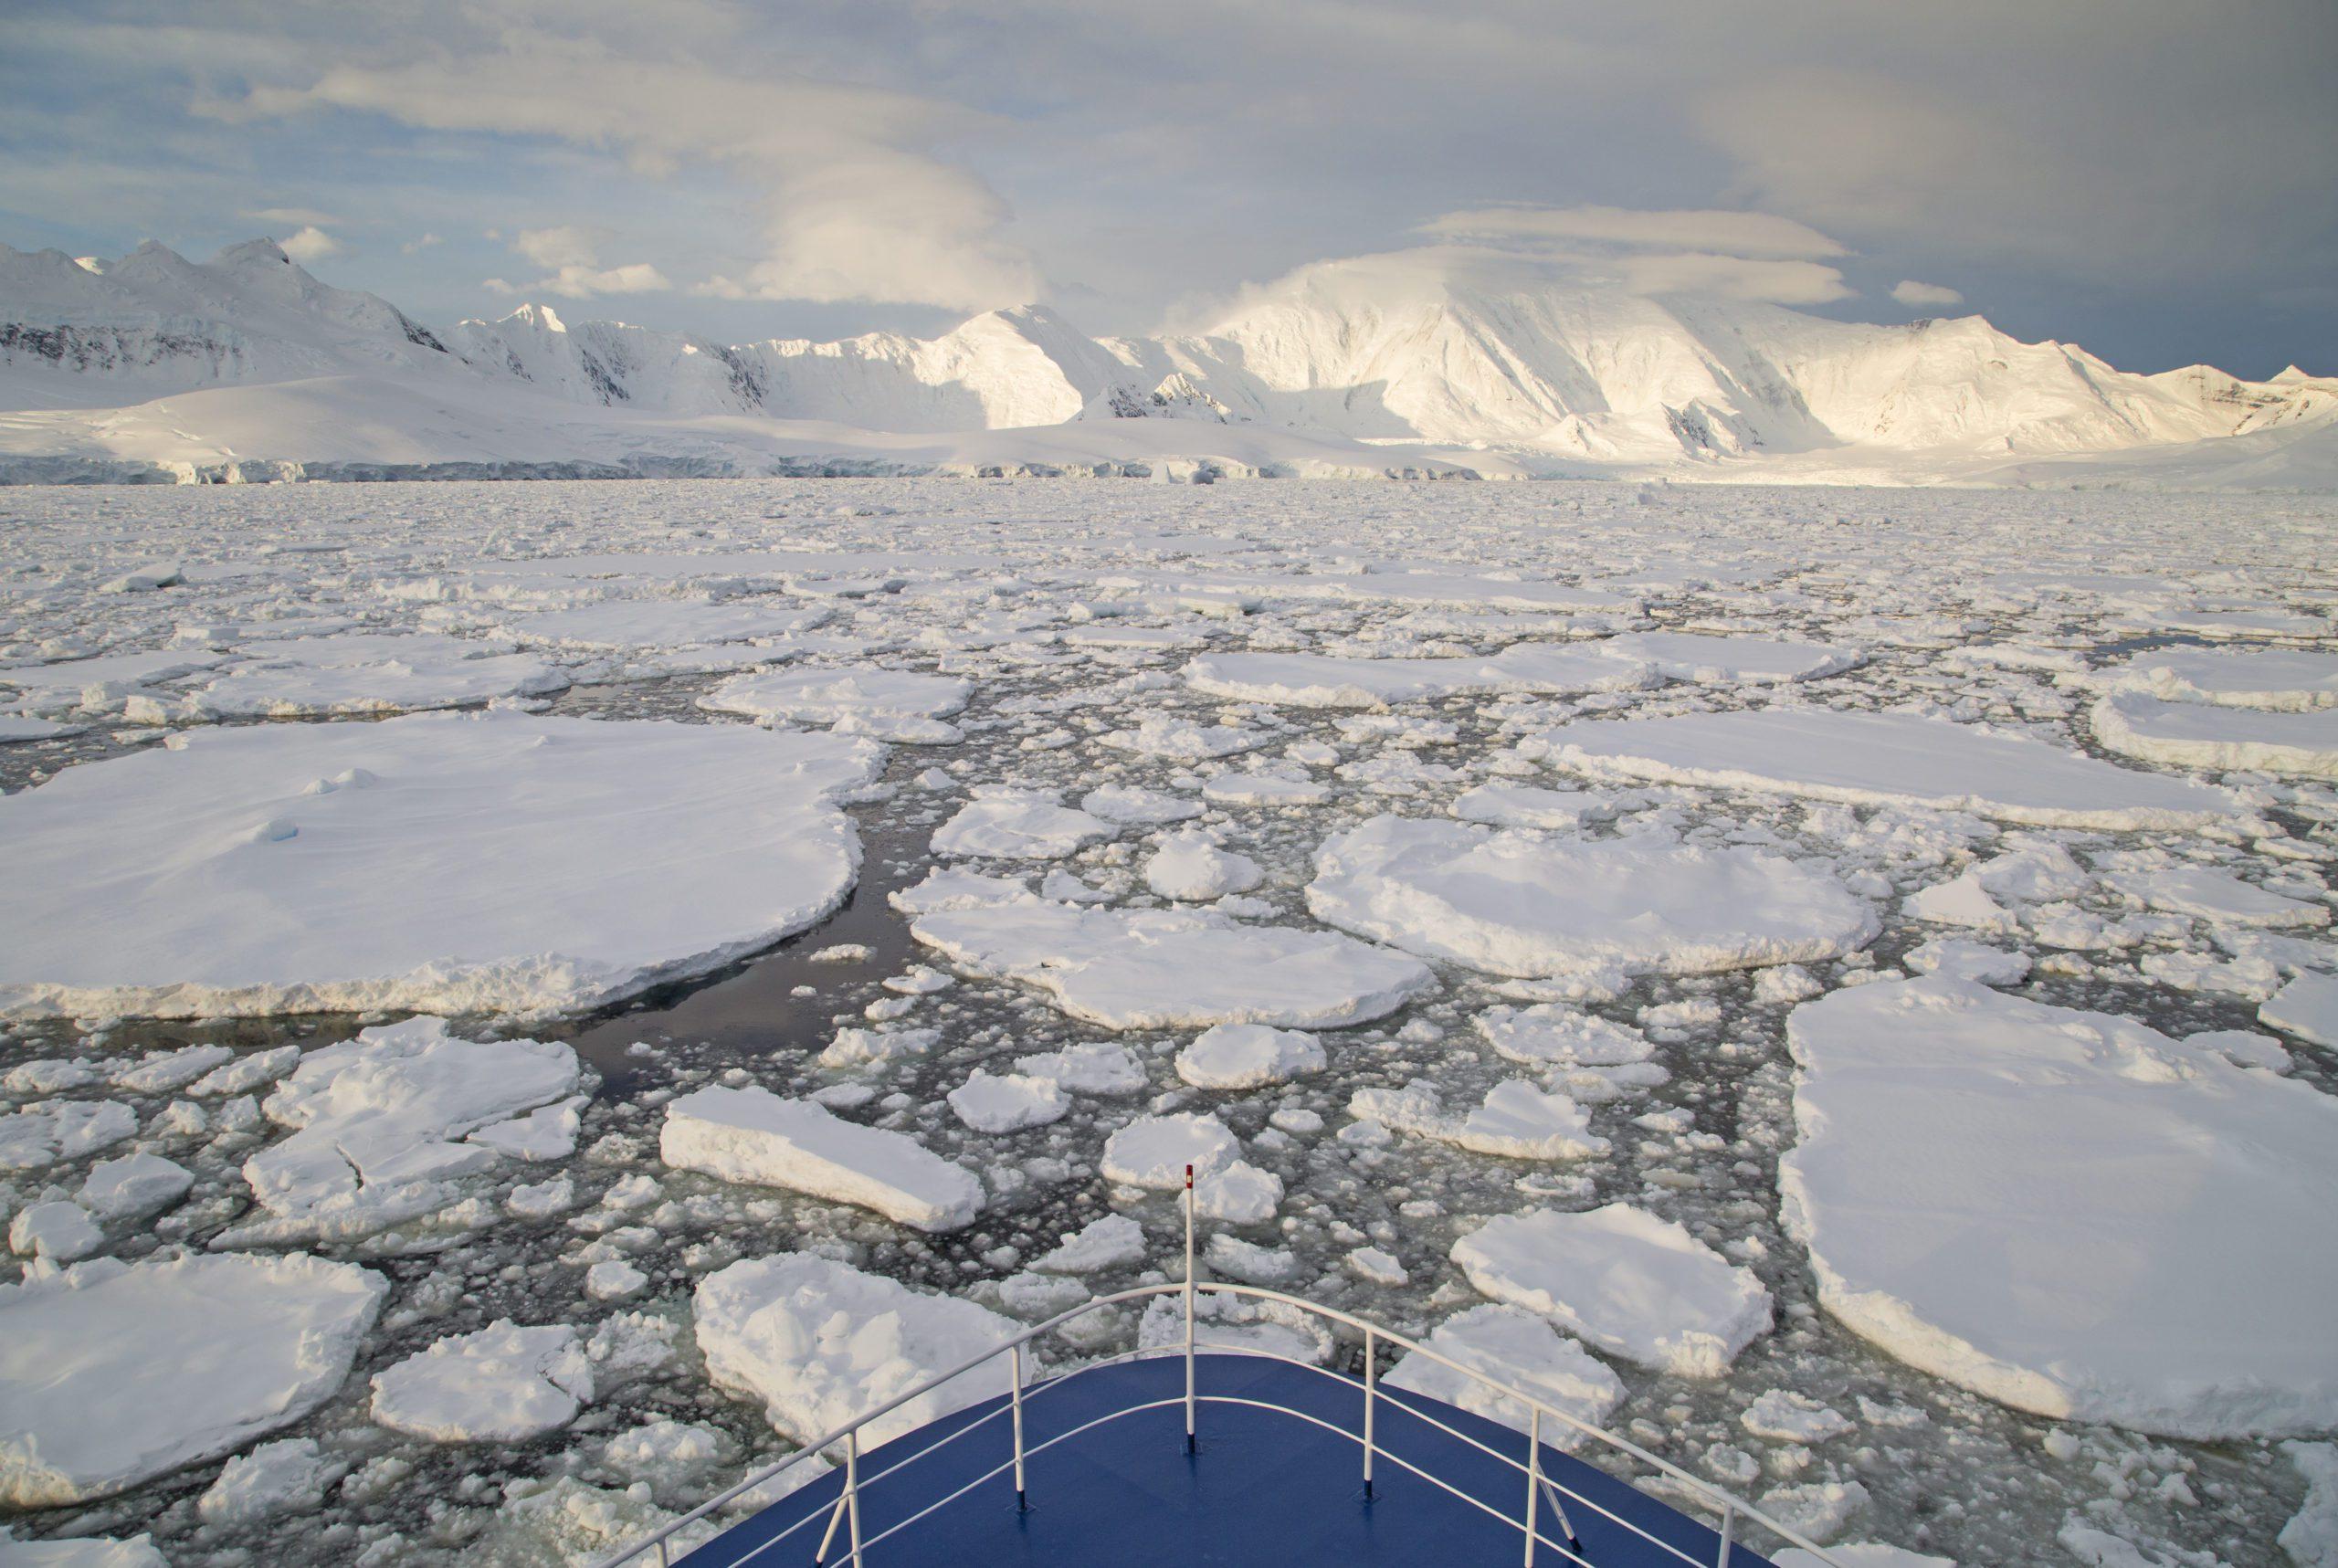 bow of ship breaking through broken up ice in the Antarctic seas